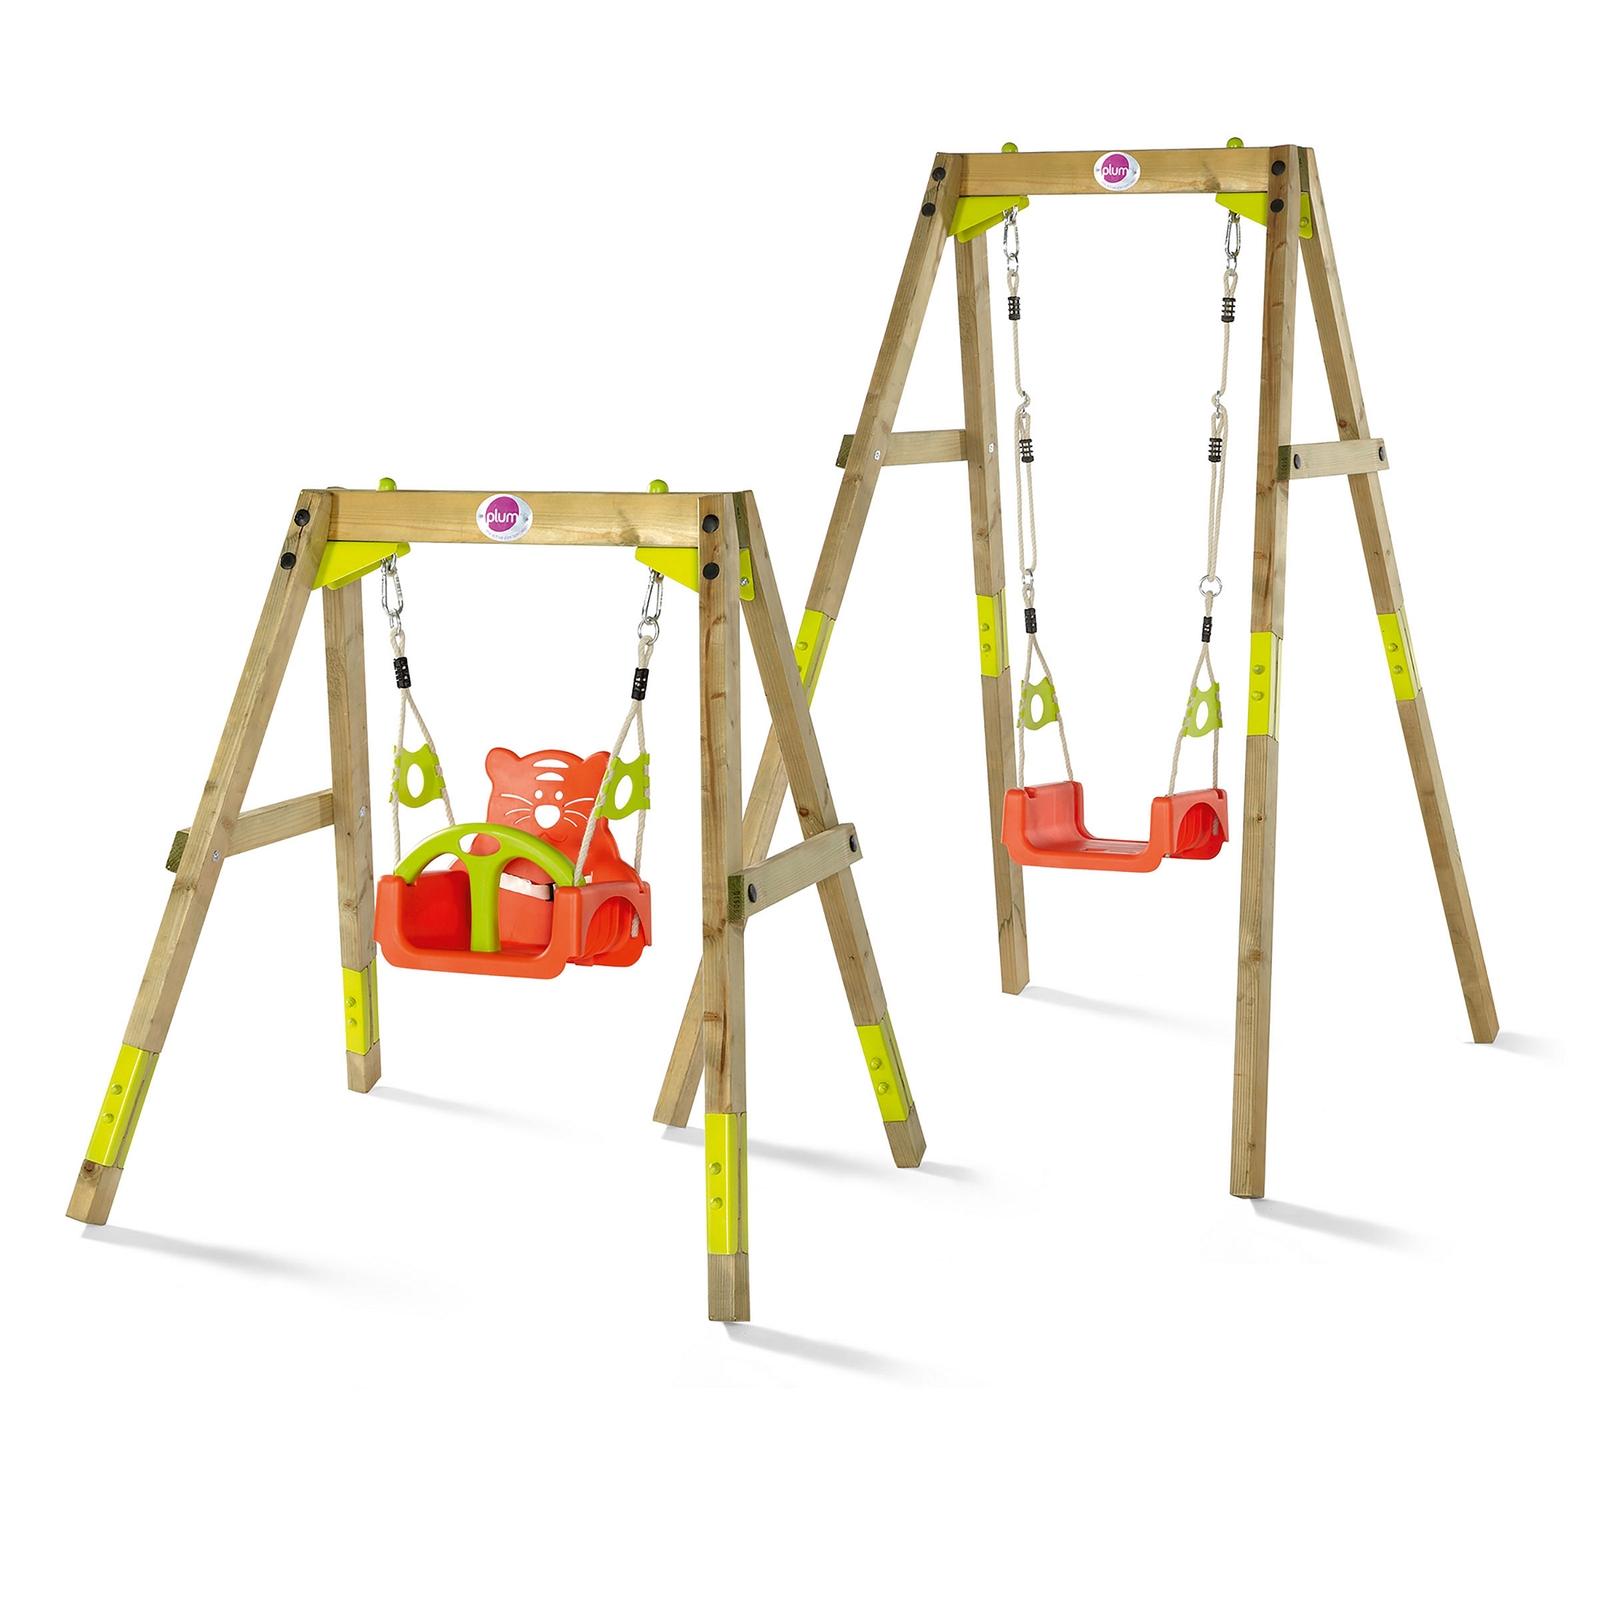 Plum® 3 in 1 Wooden Growing Swing Set